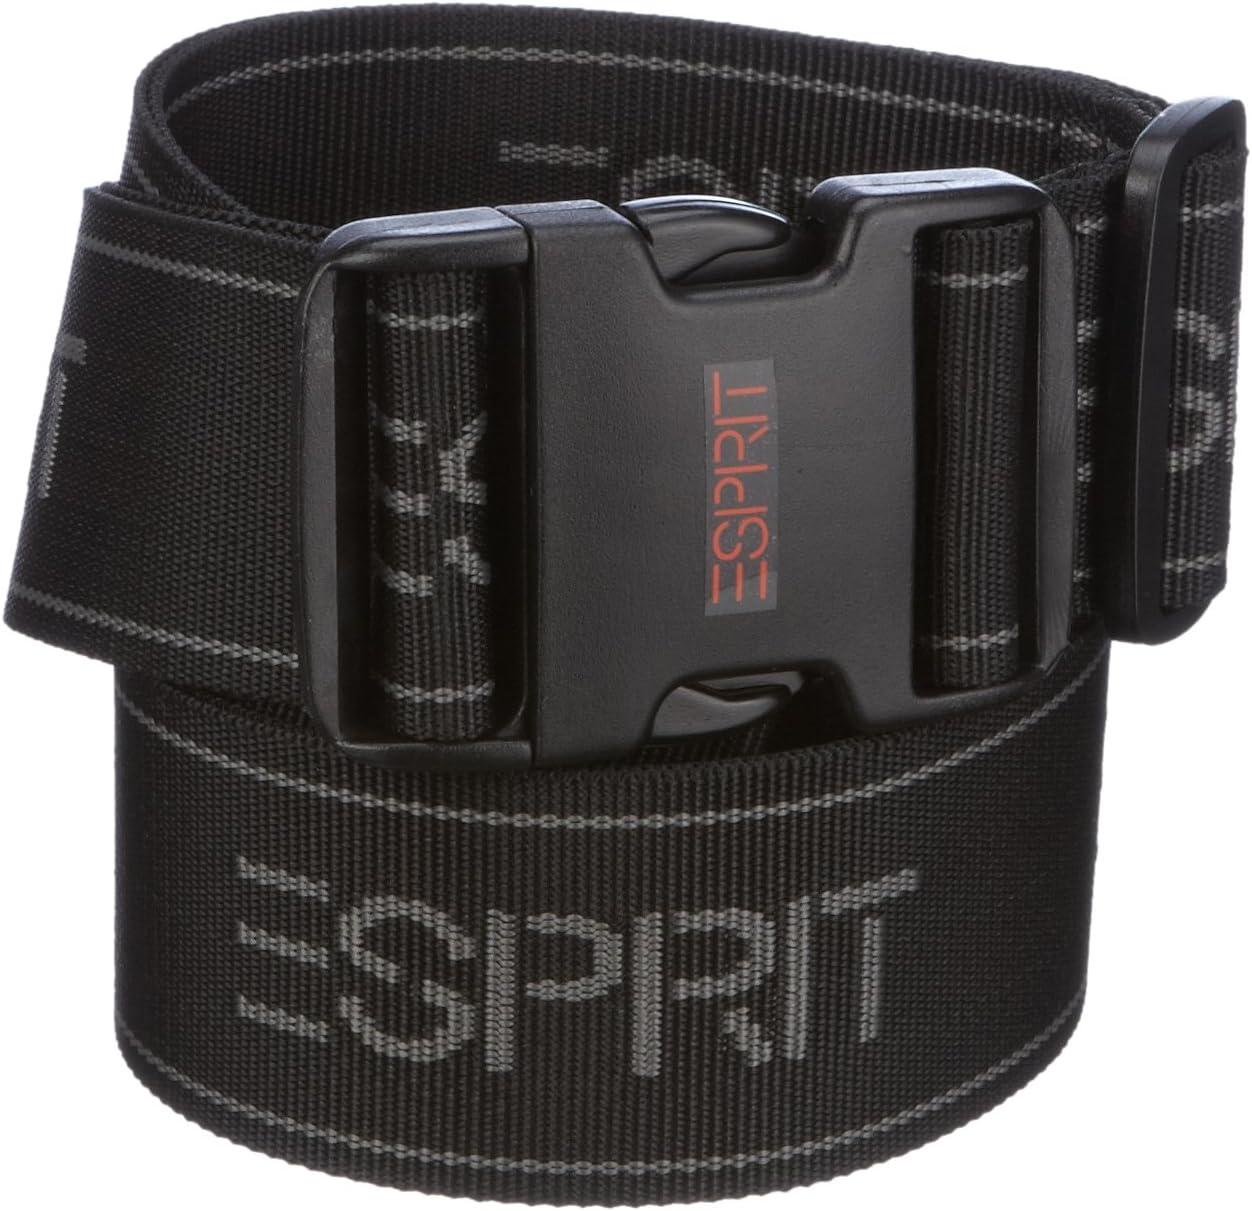 ESPRIT Trolleygurt black-grey 1